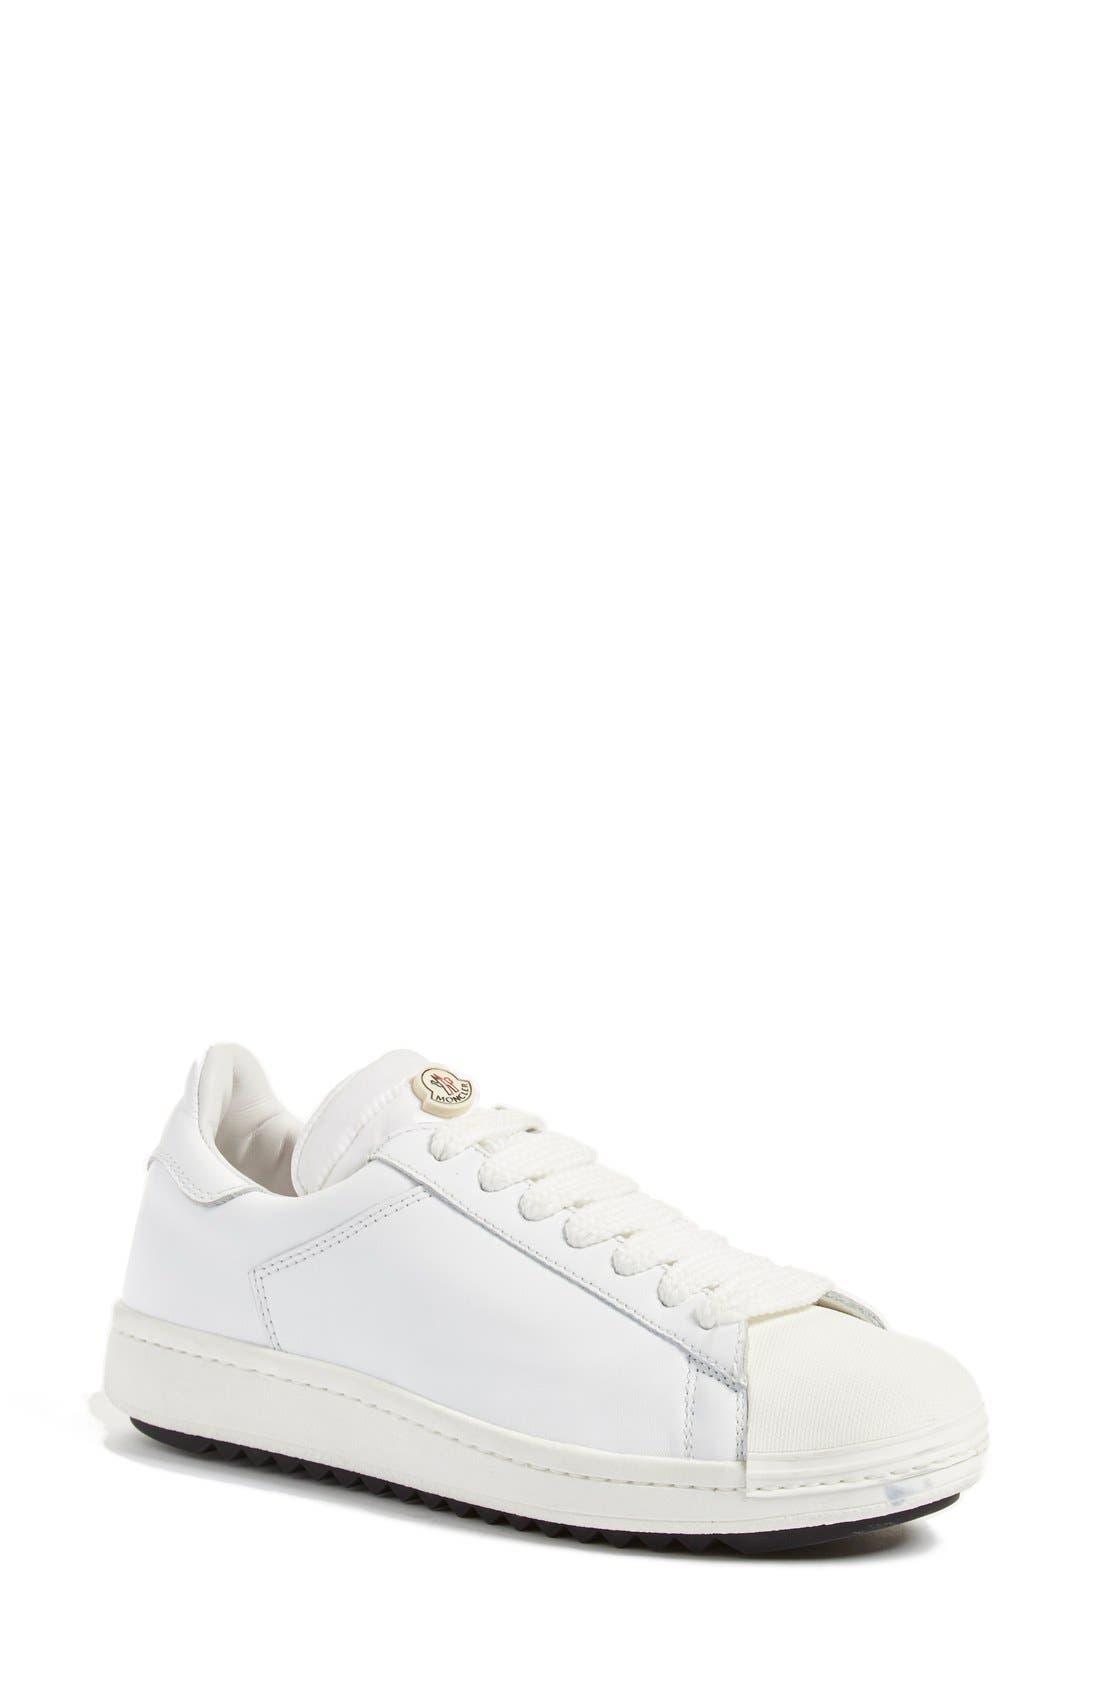 MONCLER Angeline Scarpa Sneaker